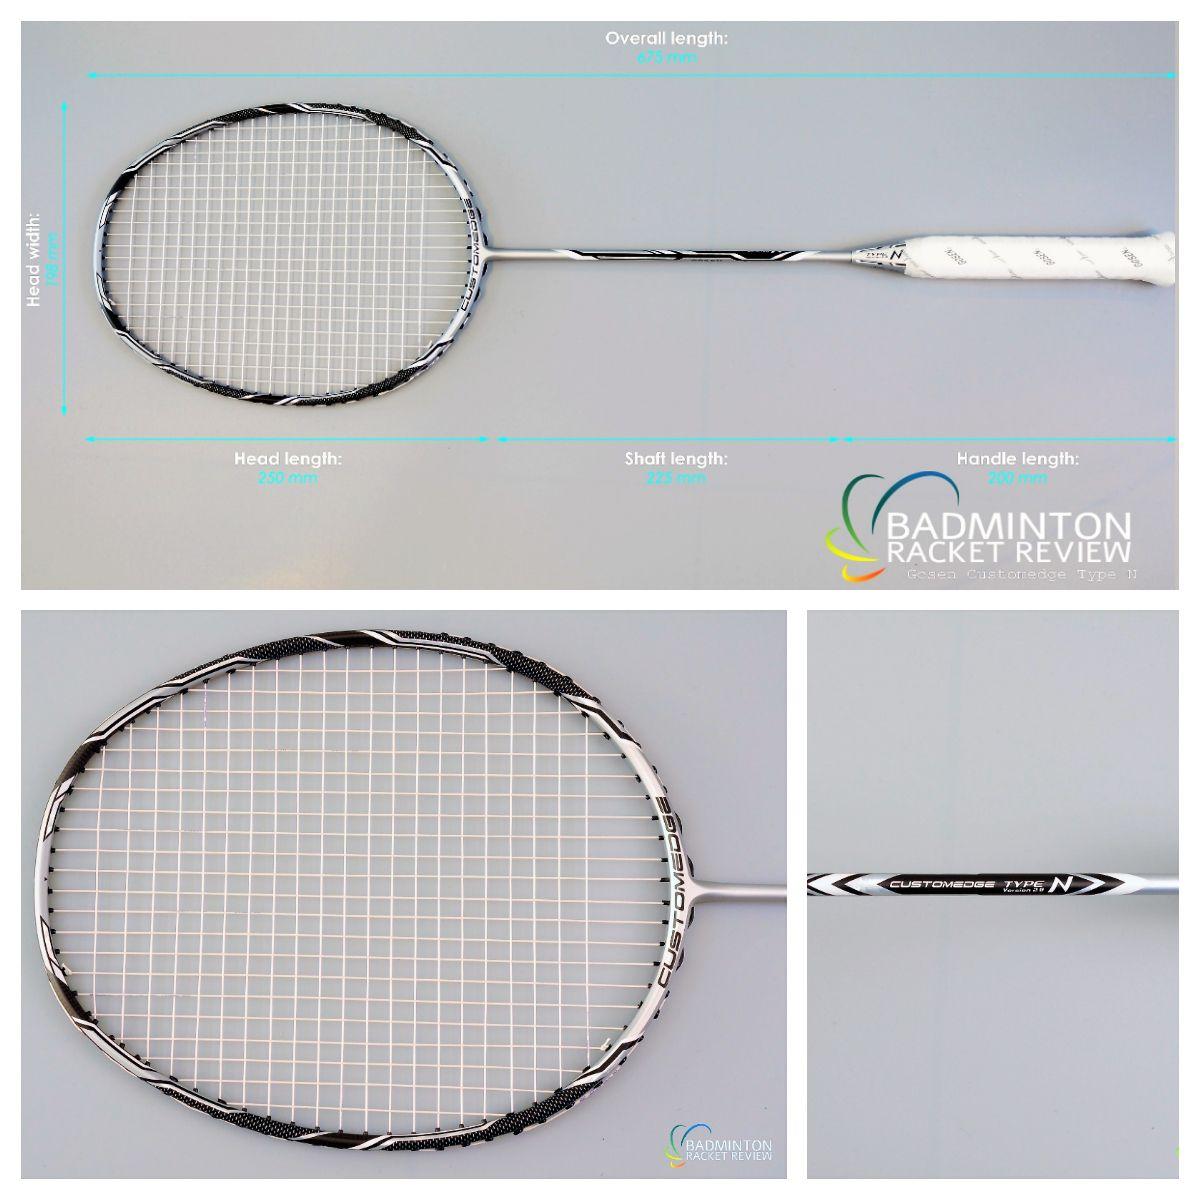 Gosen Custom Edge Type N Badminton Racket Review  To find